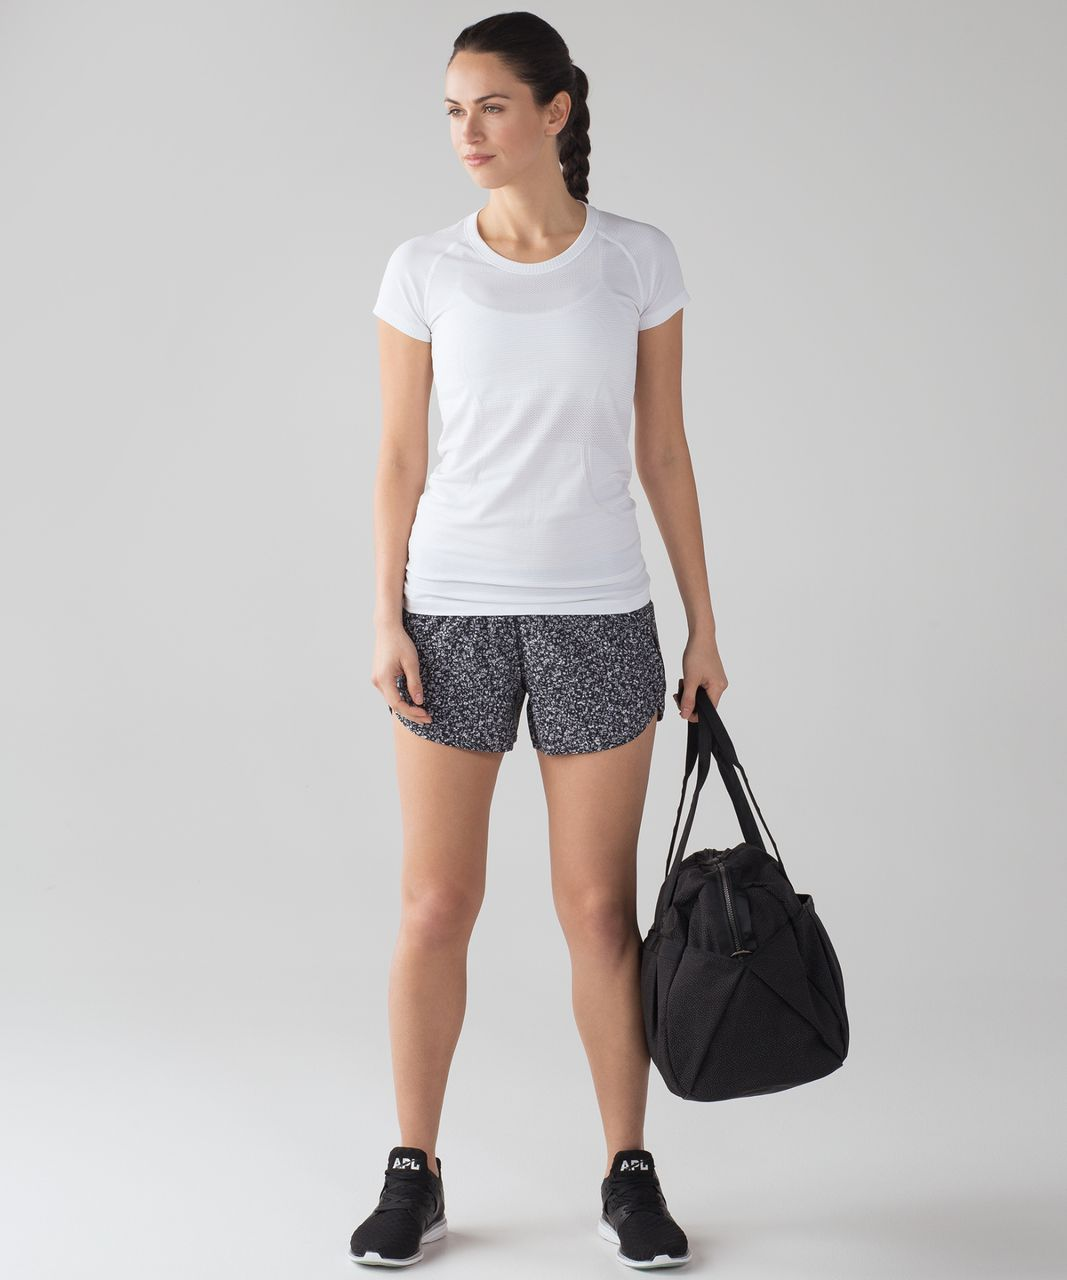 "Lululemon Tracker Short IV (4-way Stretch 4"") - Daisy Dust Alpine White Black / Black"